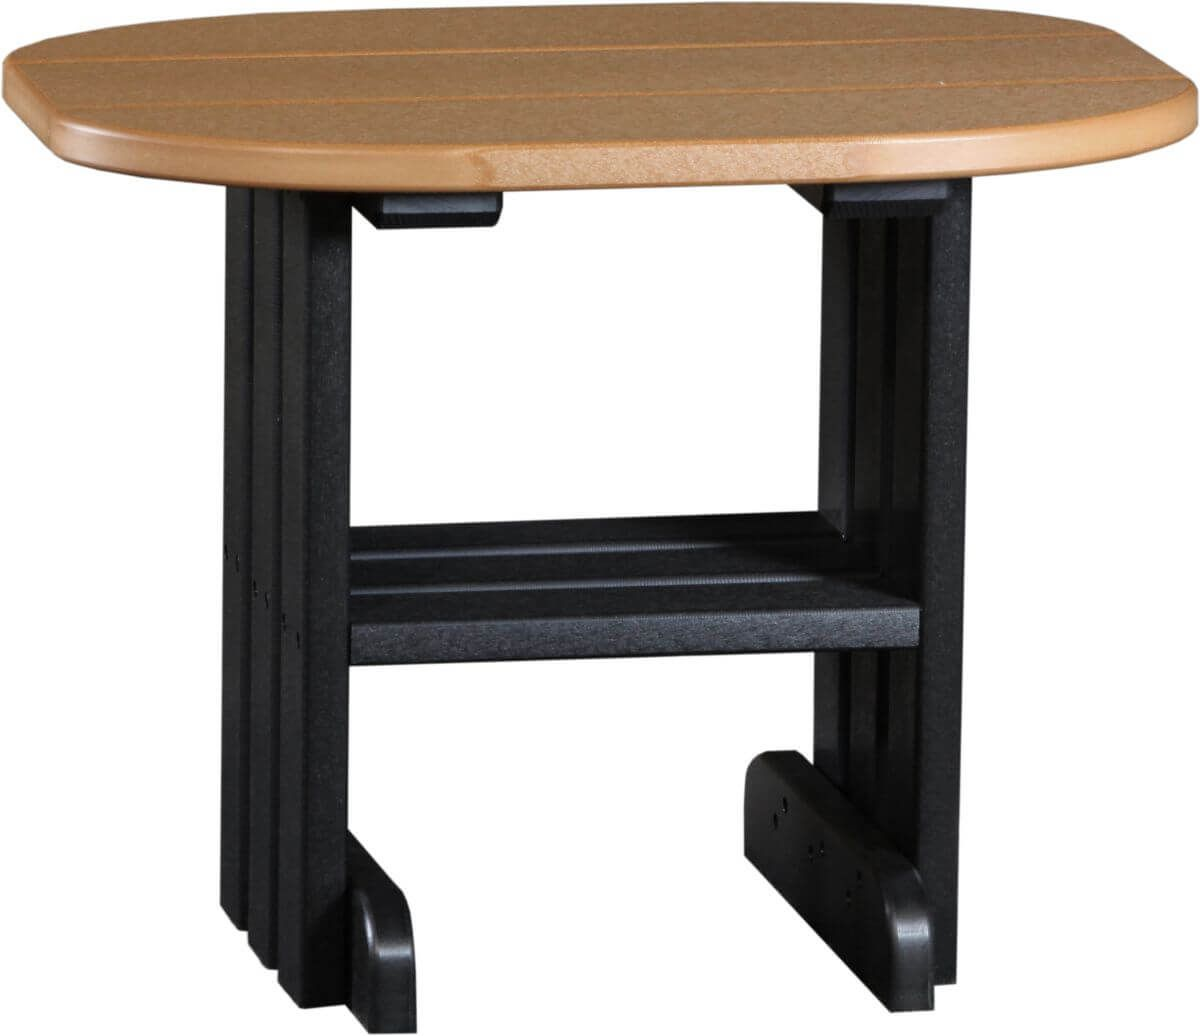 Cedar and Black Tahiti Outdoor Side Table